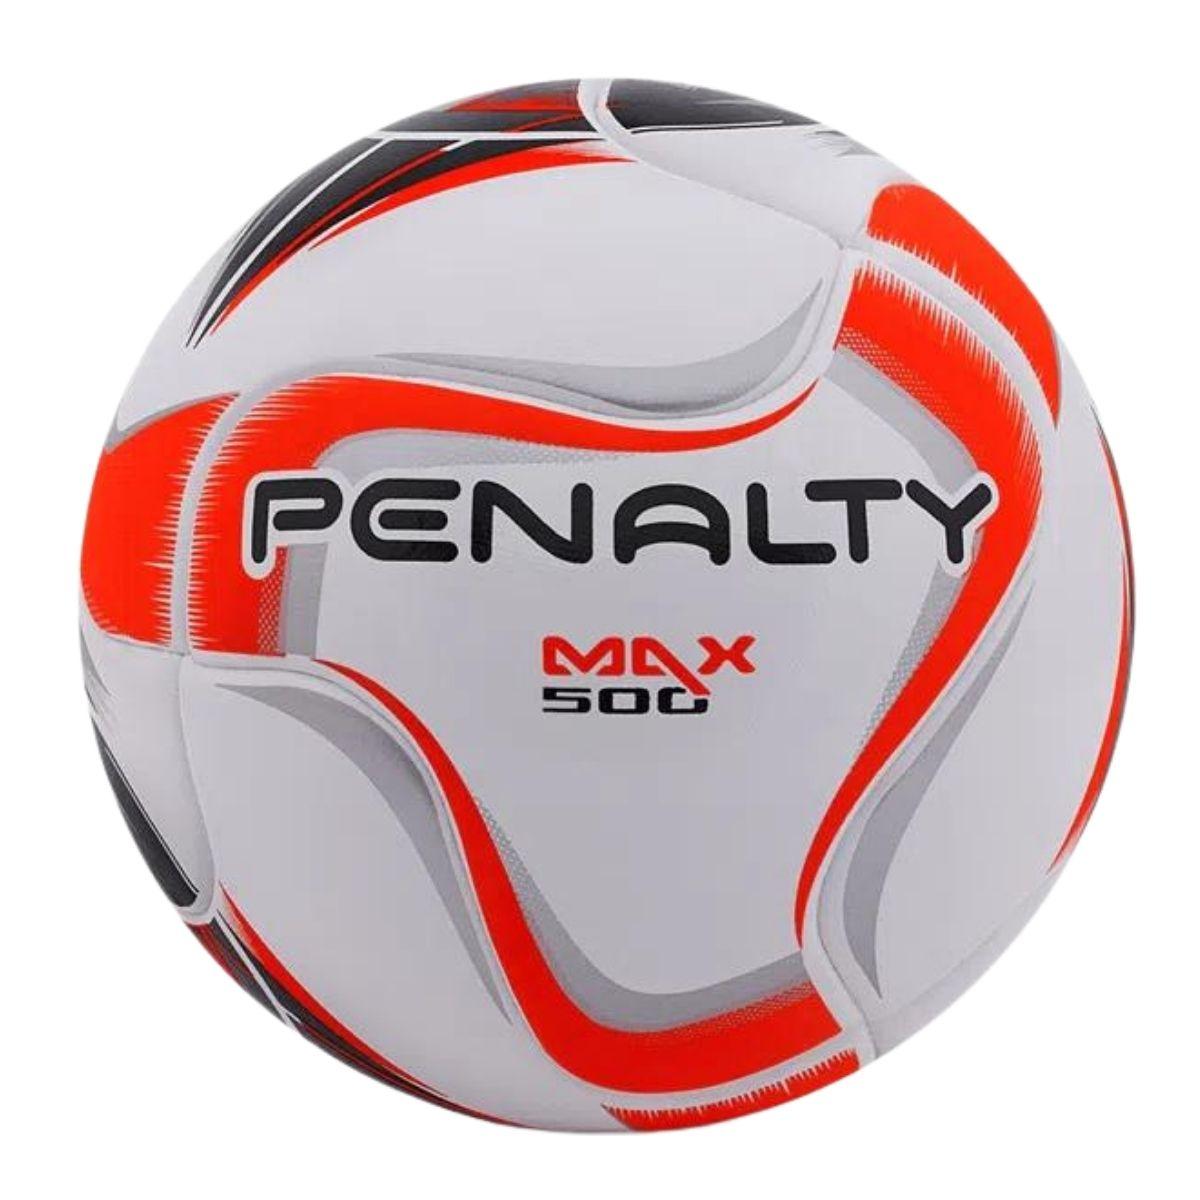 Bola de Futsal Penalty Max 500 Termotec X